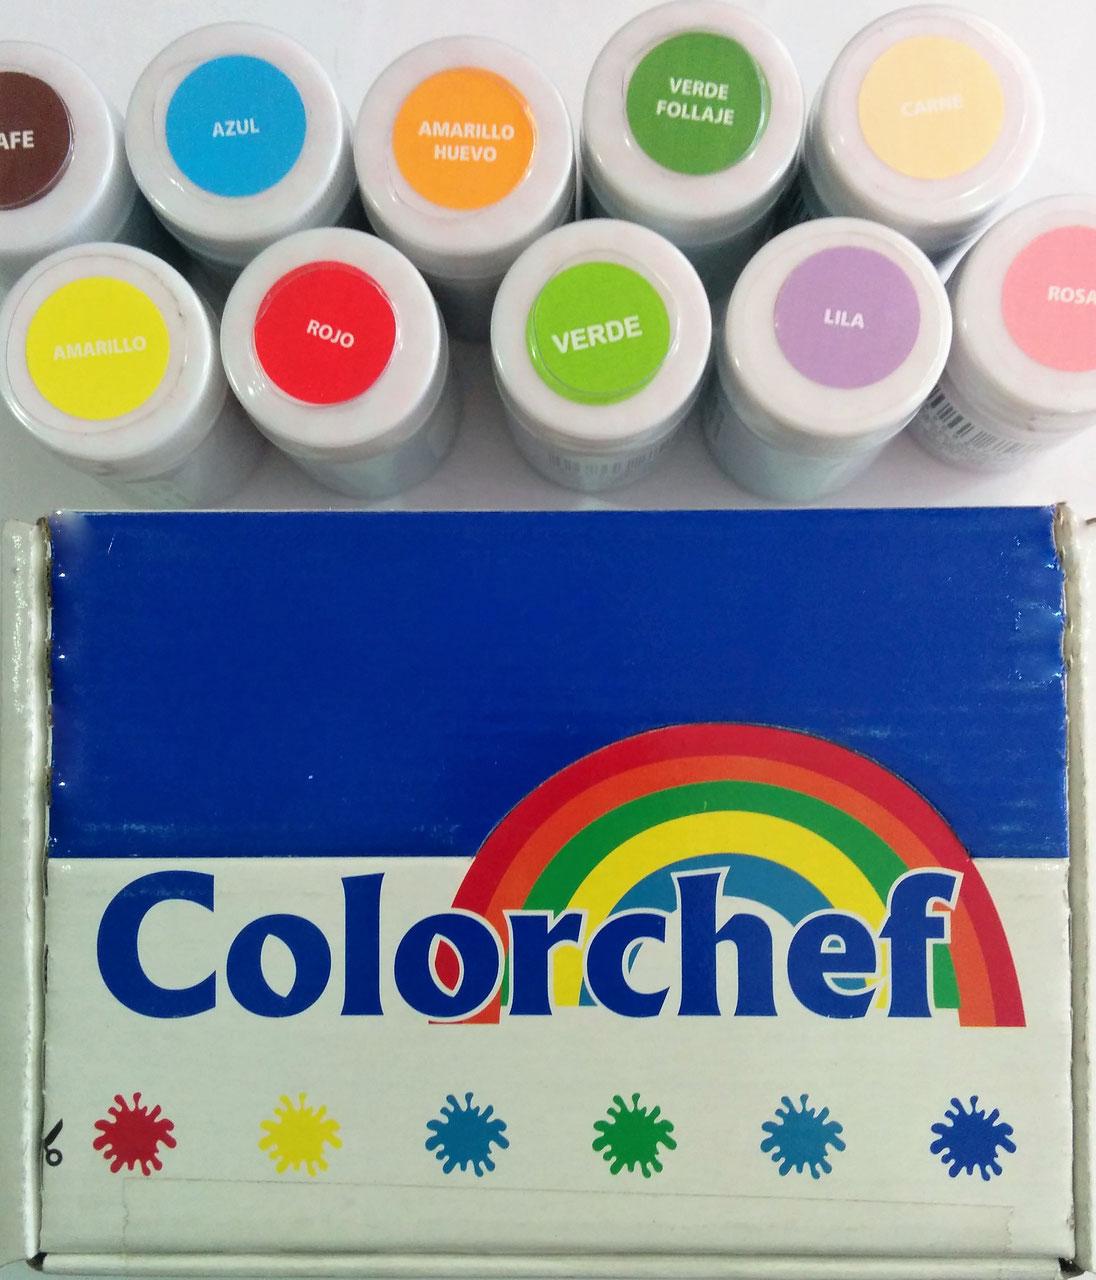 Color en pasta Colorchef 50g Rosa